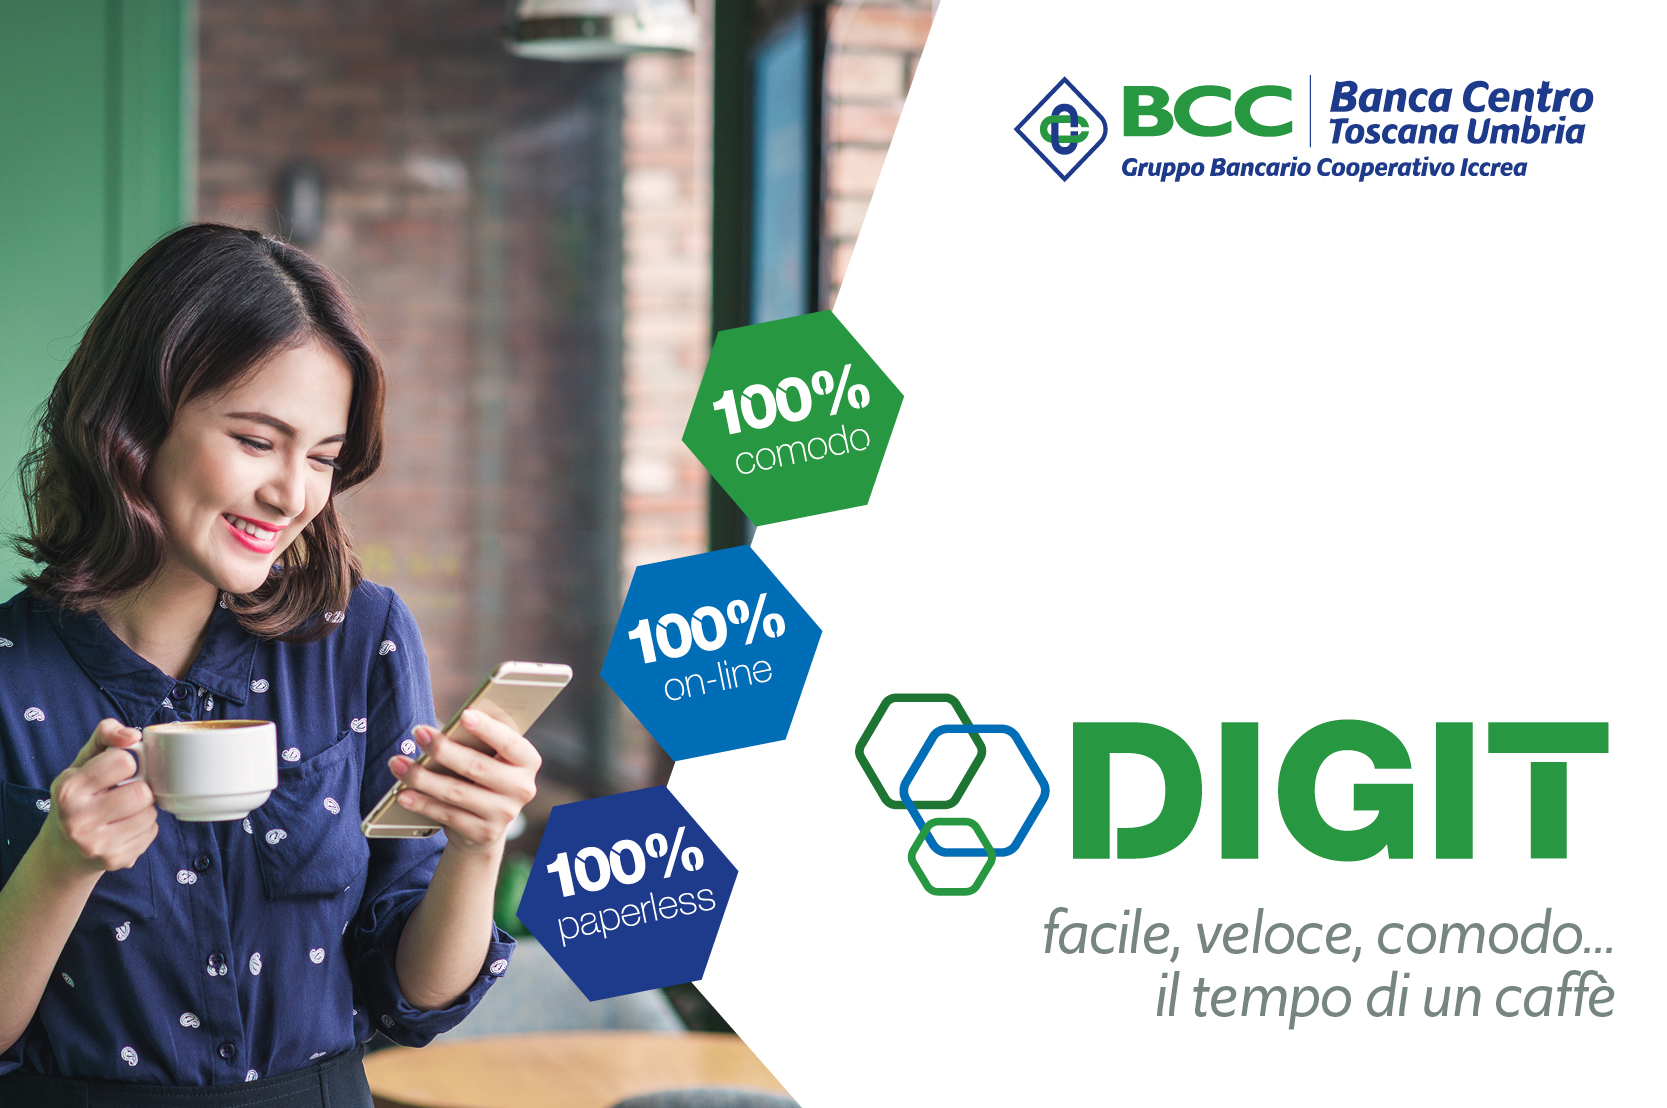 Bcc Montepulciano Nuova Sede banca centro — home page